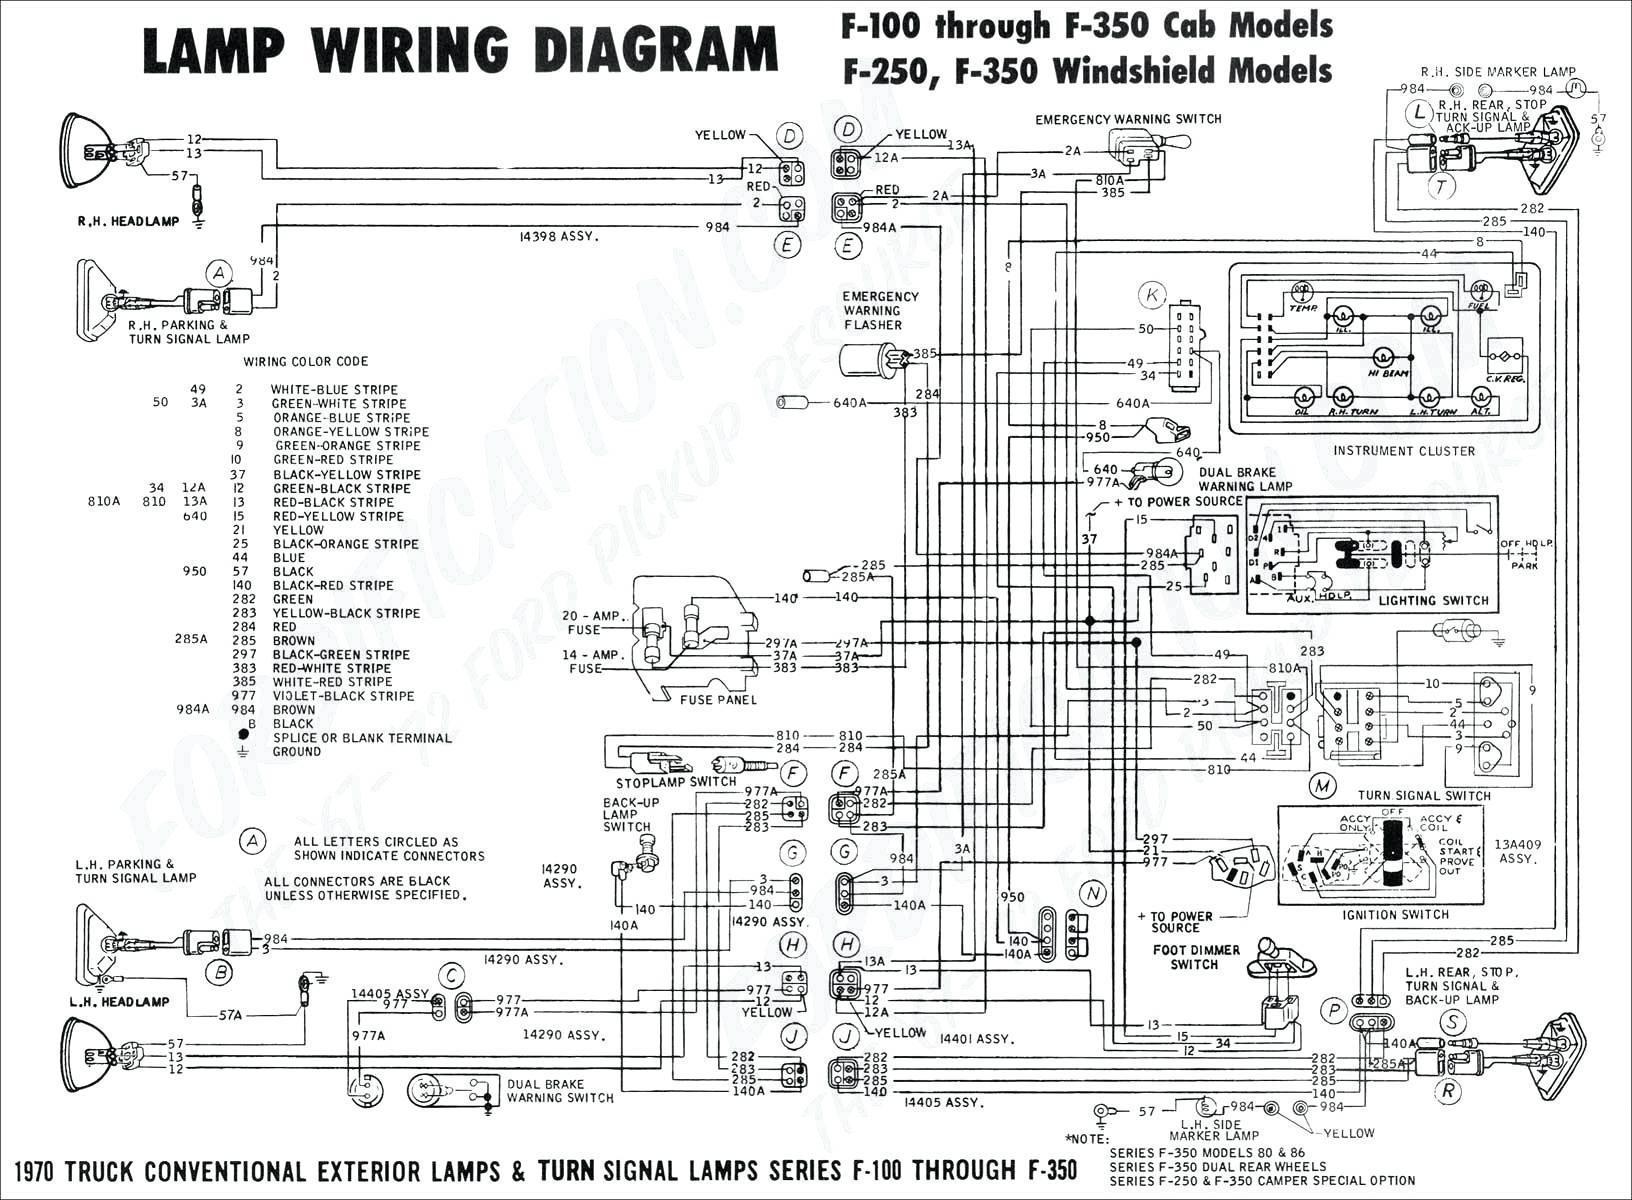 2000 Dodge Caravan Wiring Diagram Dodge Ram Running Light Wiring Diagram Expert Wiring Diagrams Of 2000 Dodge Caravan Wiring Diagram